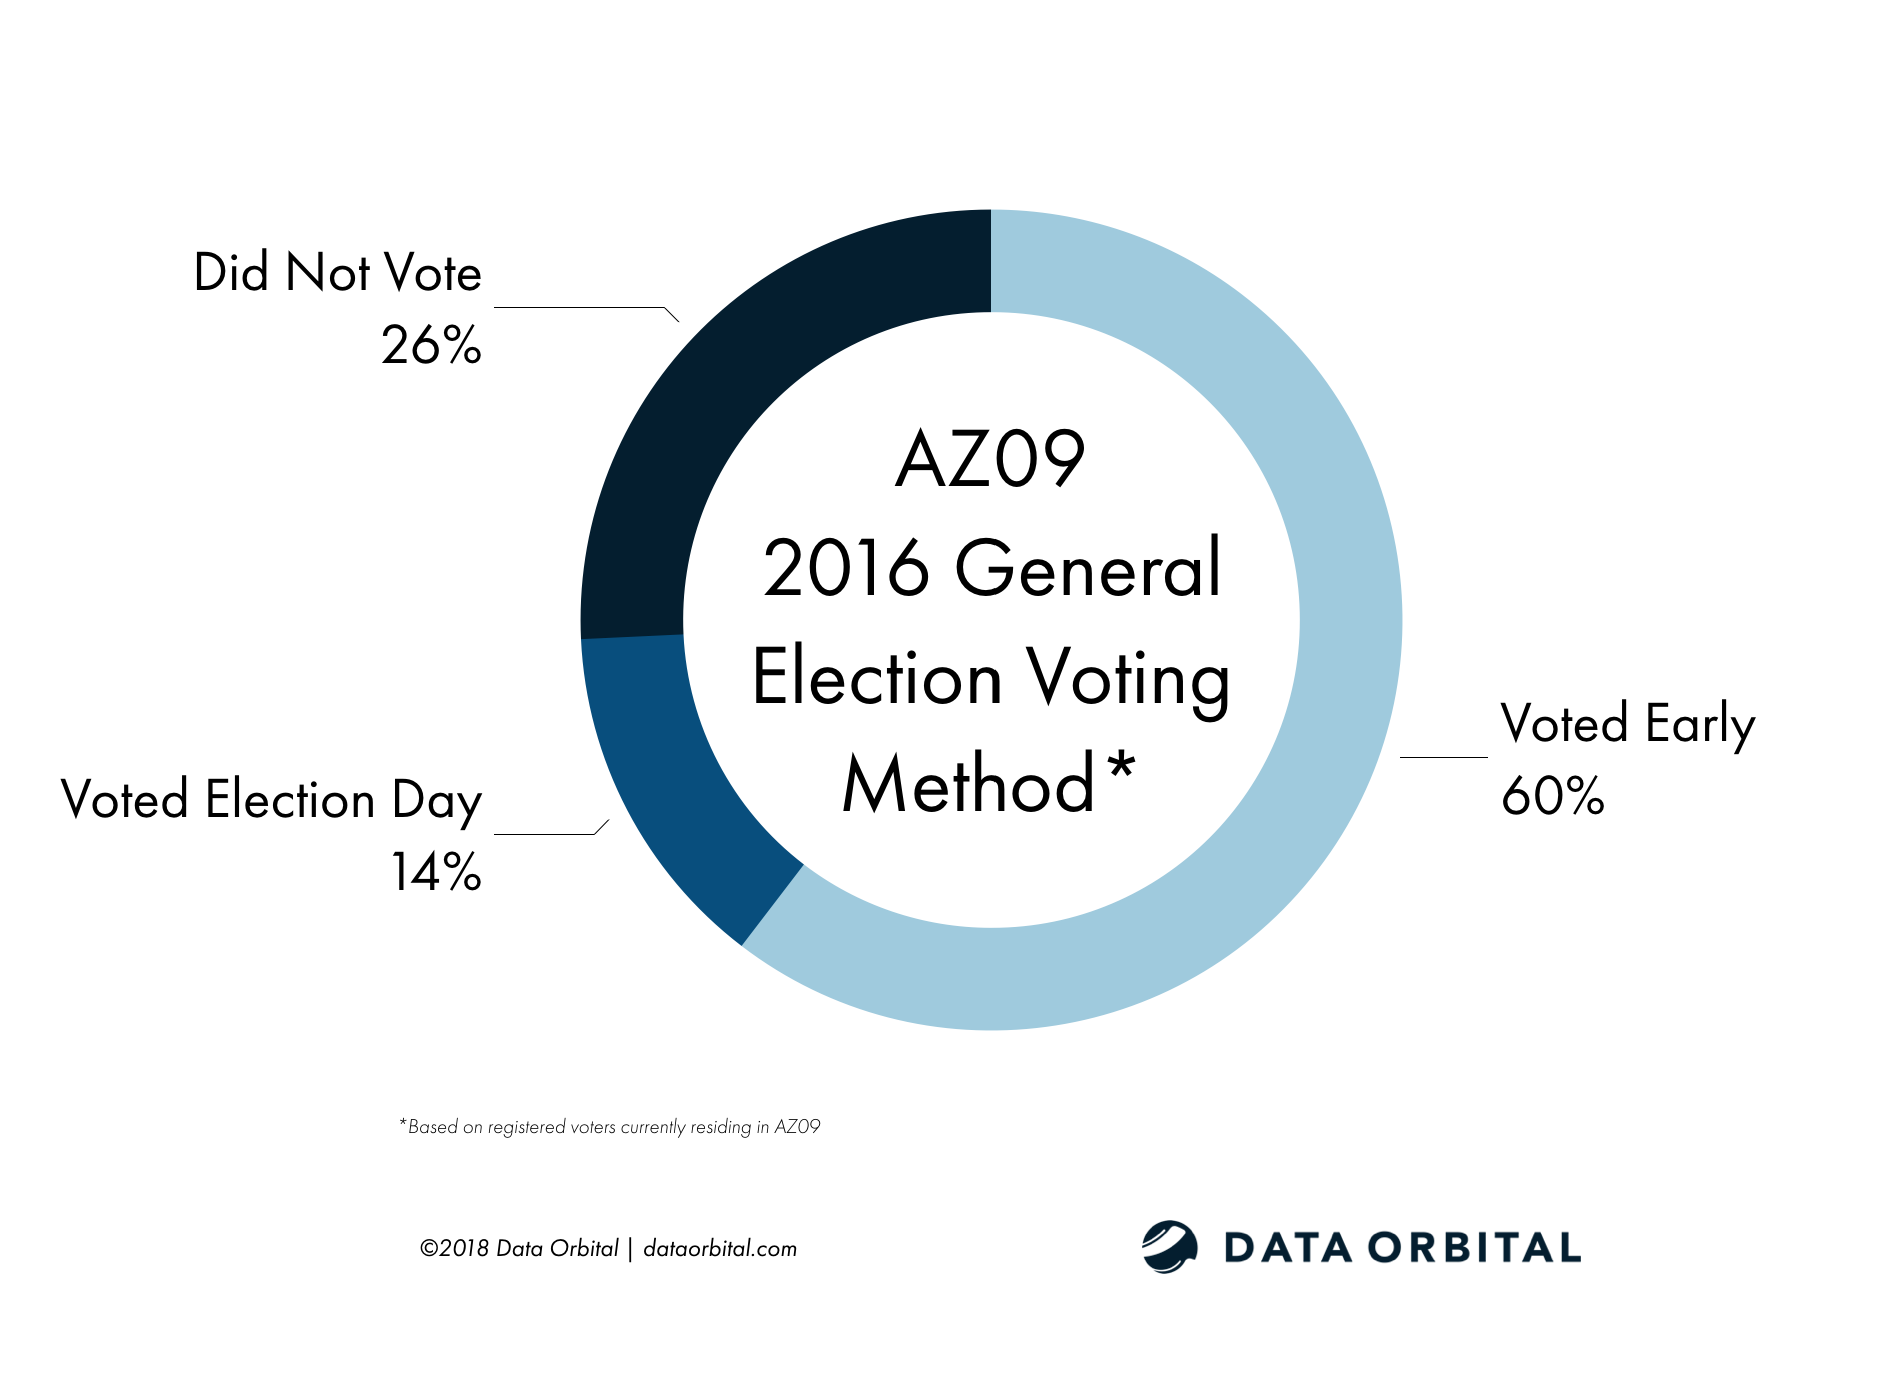 AZ09 District Profile 2016 General Election Voting Method